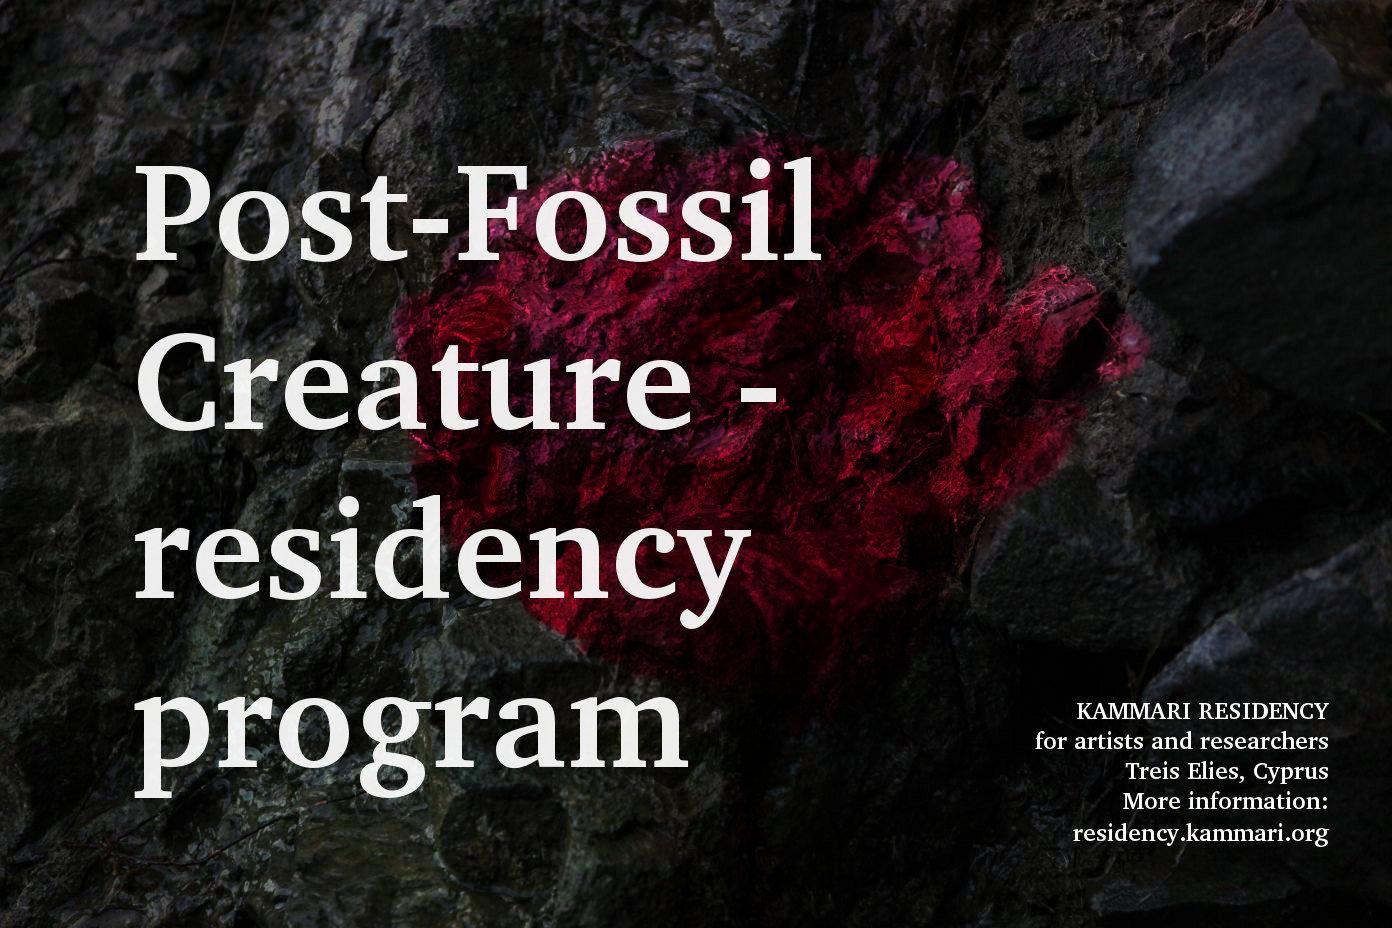 Post-Fossil Creature -residency program